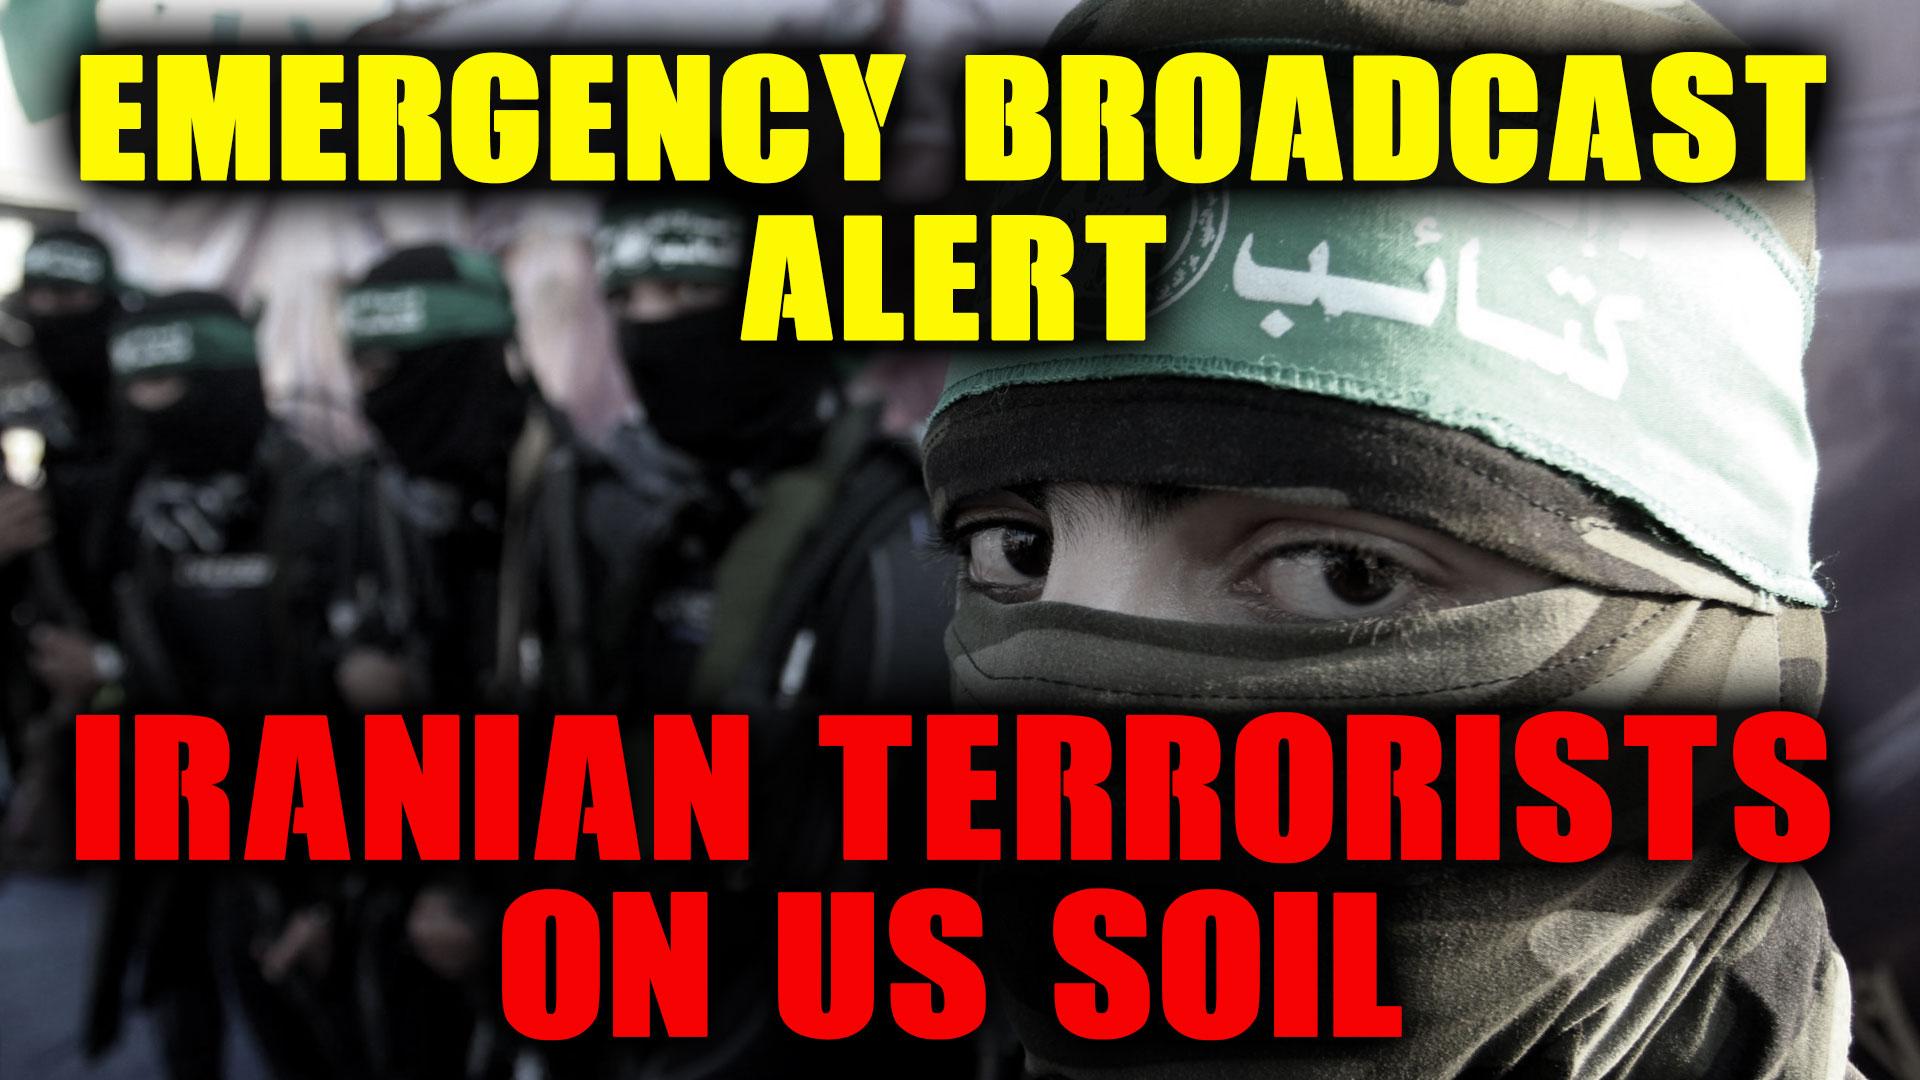 Emergency-Broadcast-Iranian-Terrorists-On-US-Soil